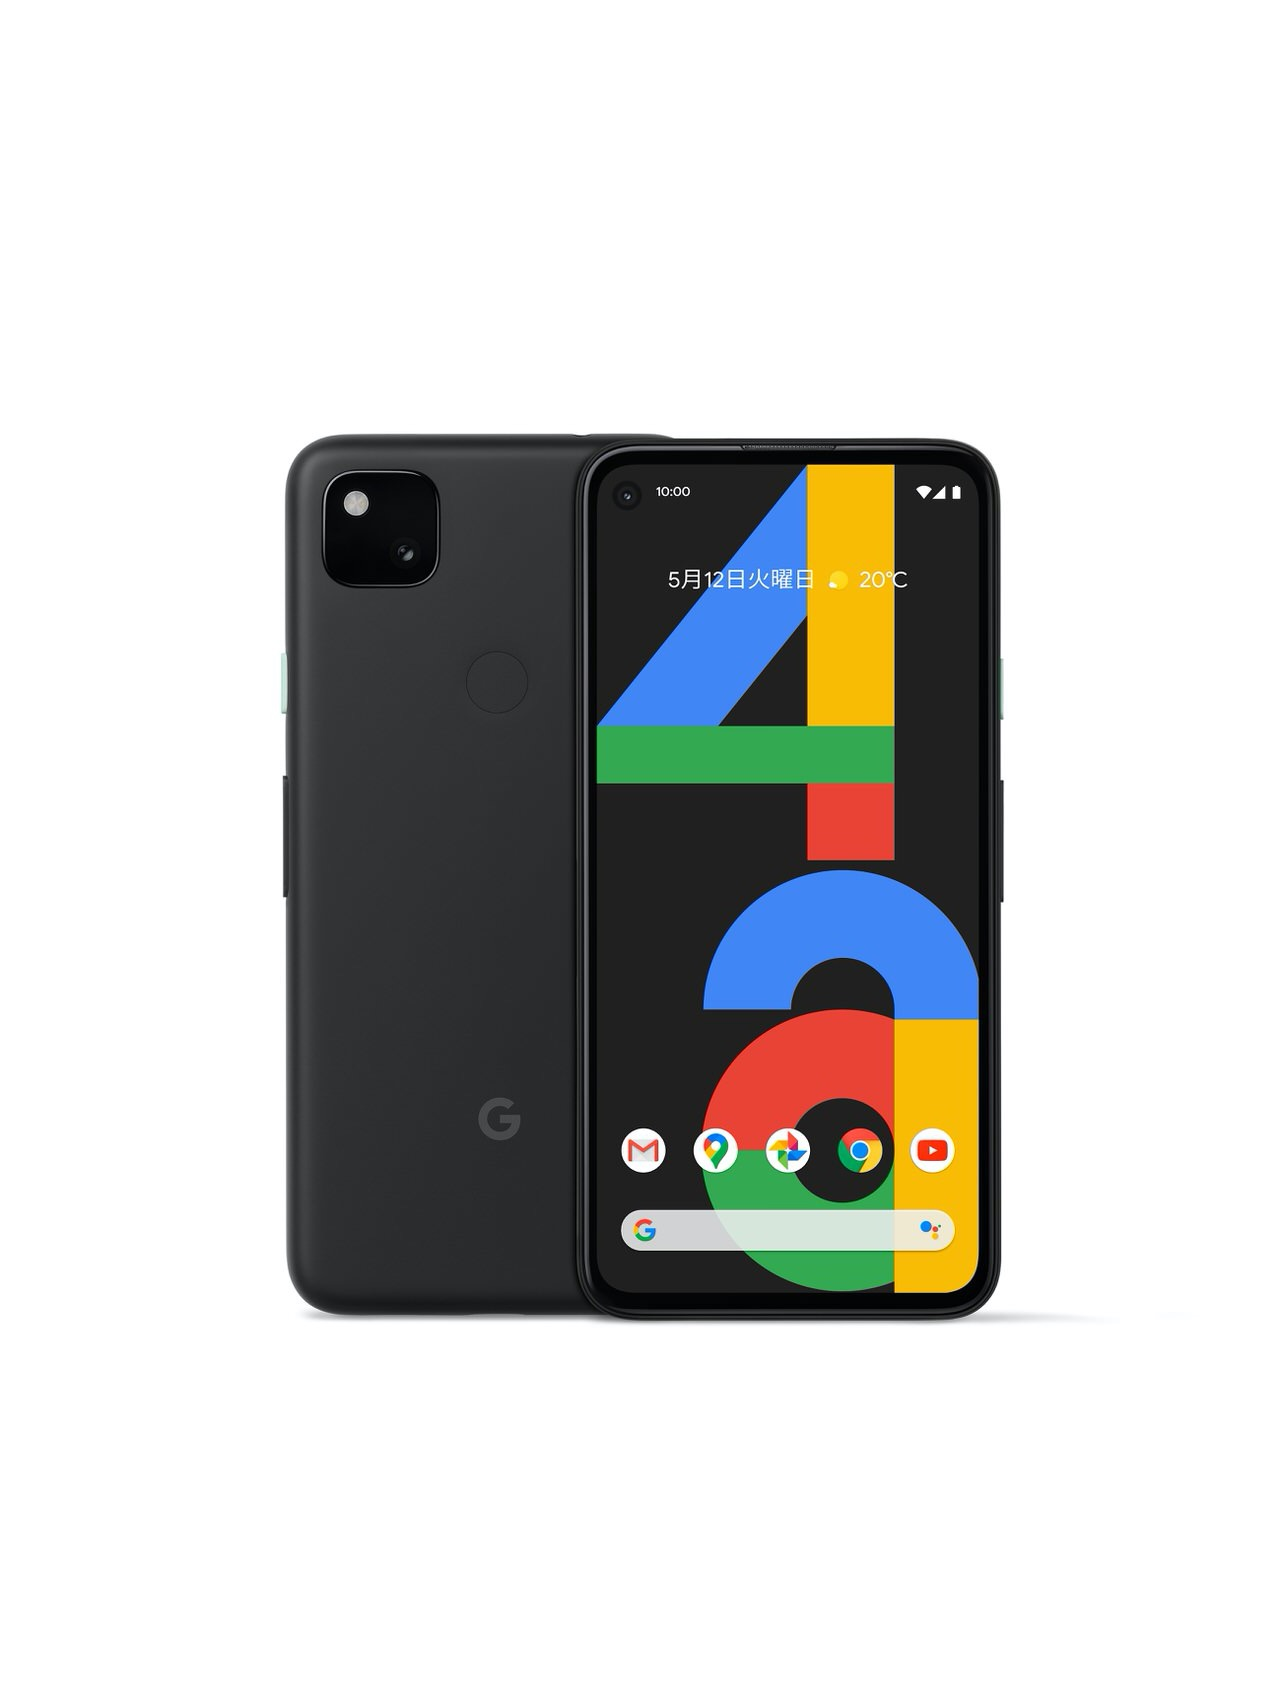 「Google Pixel 4a」42,900円で8/14より予約受付開始 〜「Google Pixel Buds」も日本で販売開始